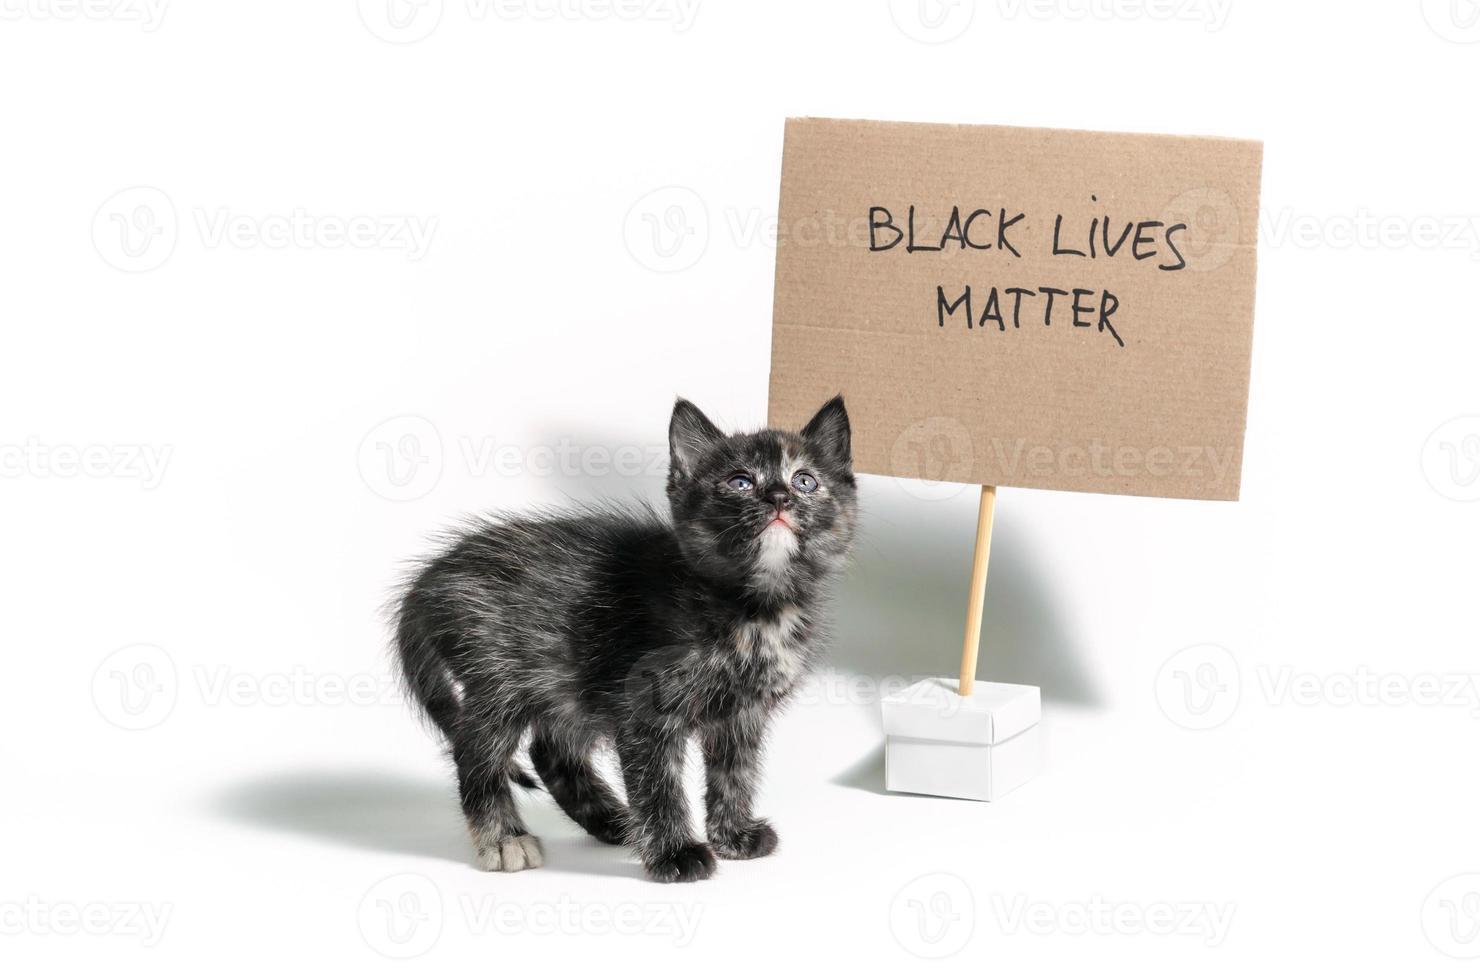 Dark calico kitten with Black Lives Matter sign photo